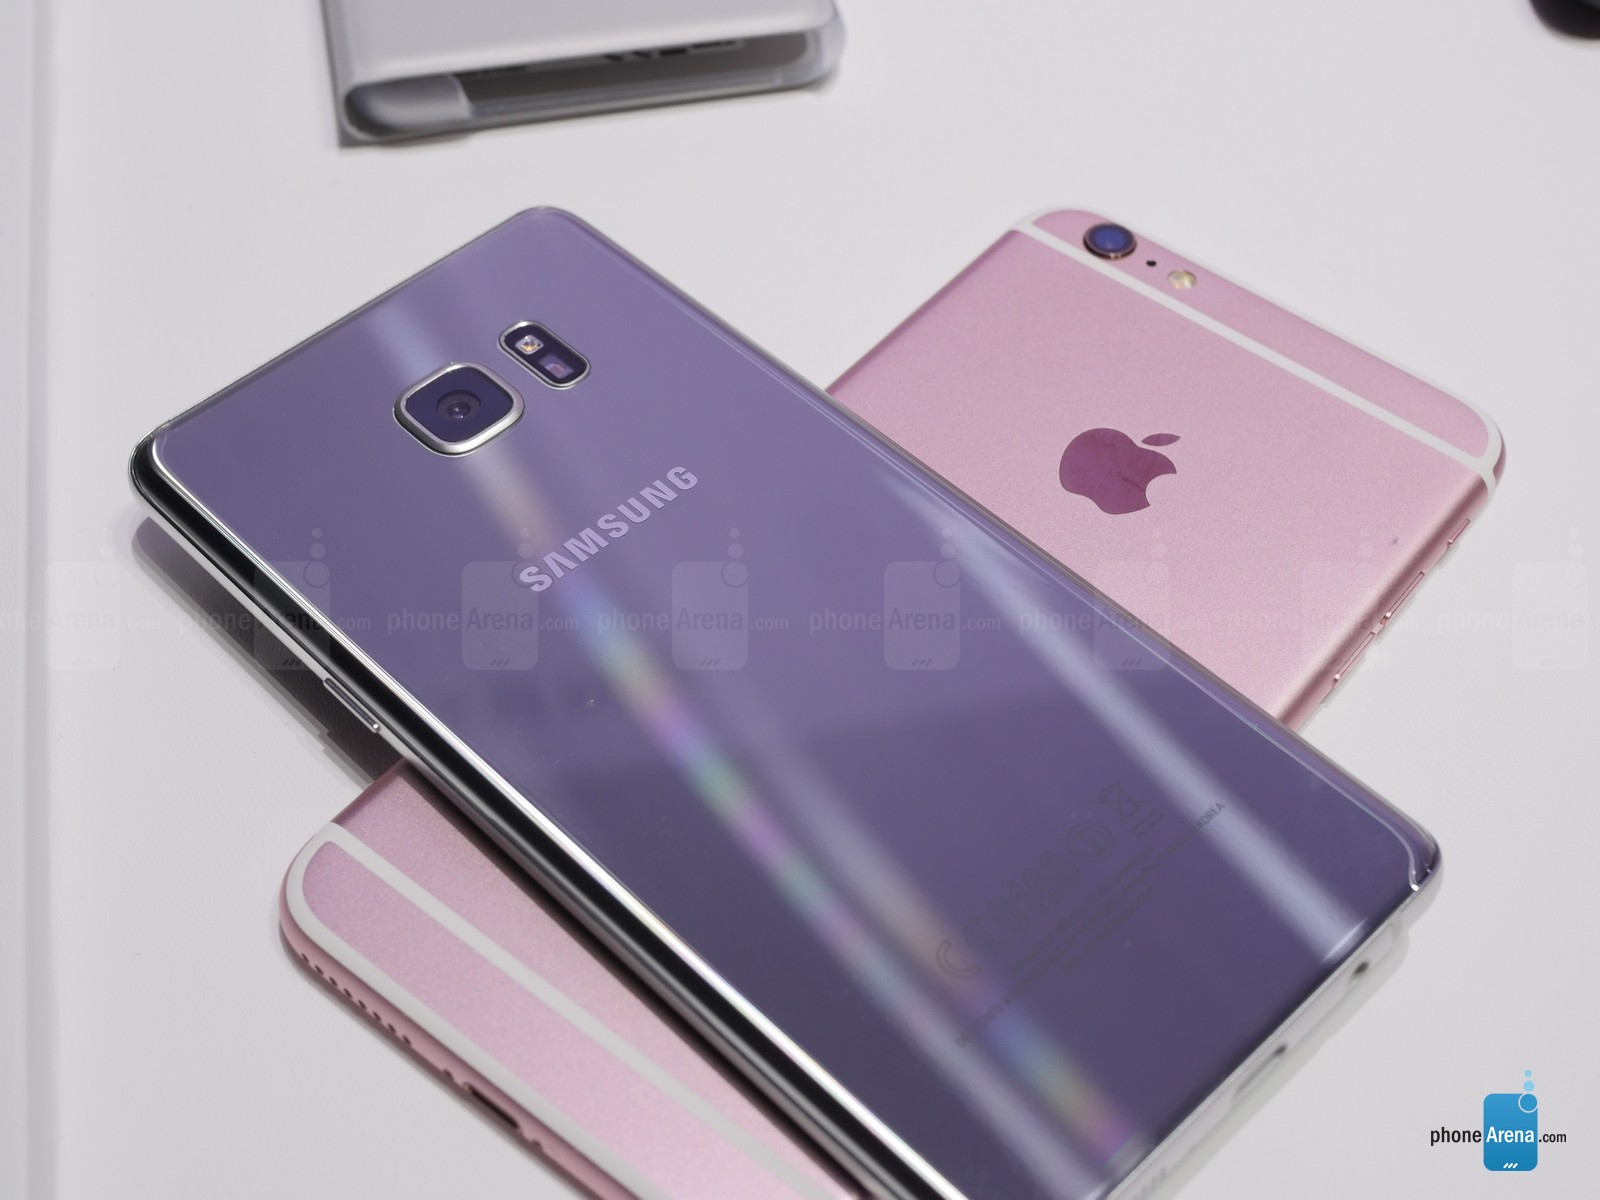 Samsung-Galaxy-Note-7-vs-Apple-iPhone-gfg6s-Plus